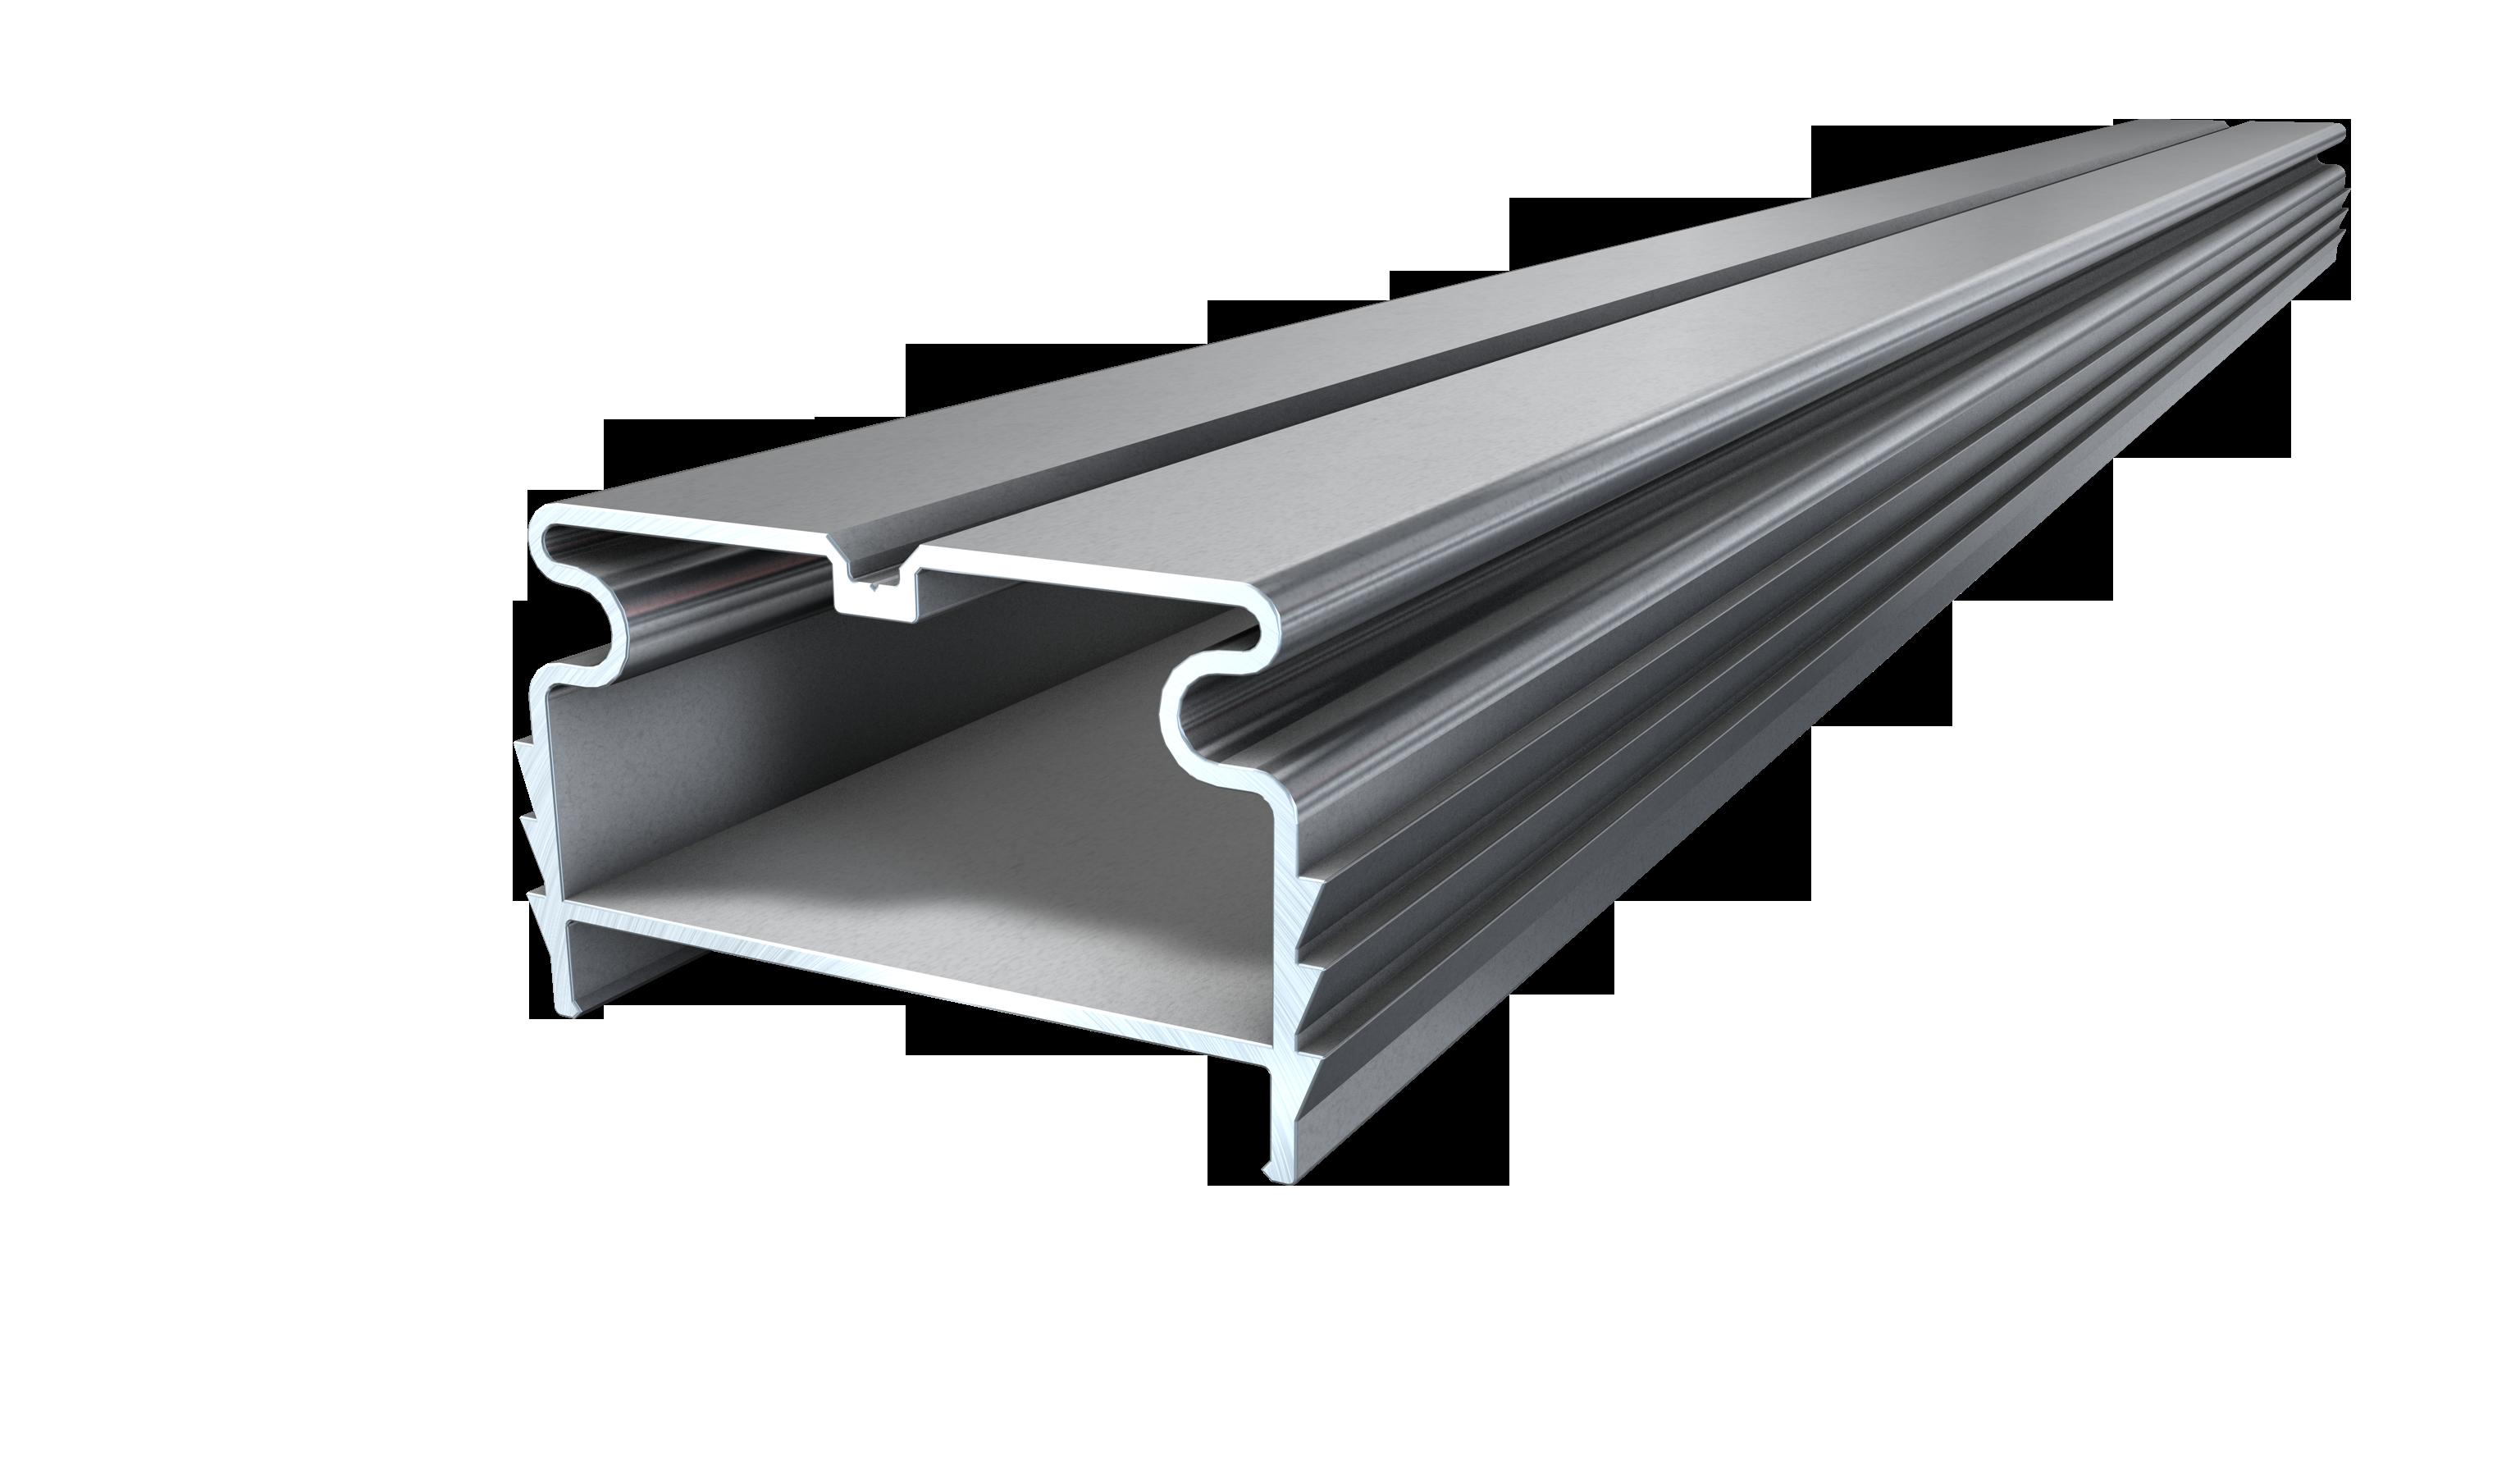 Kovalex Aluminium Profi Unterkonstruktion - 40x64x3000 mm - Aluminium Silber